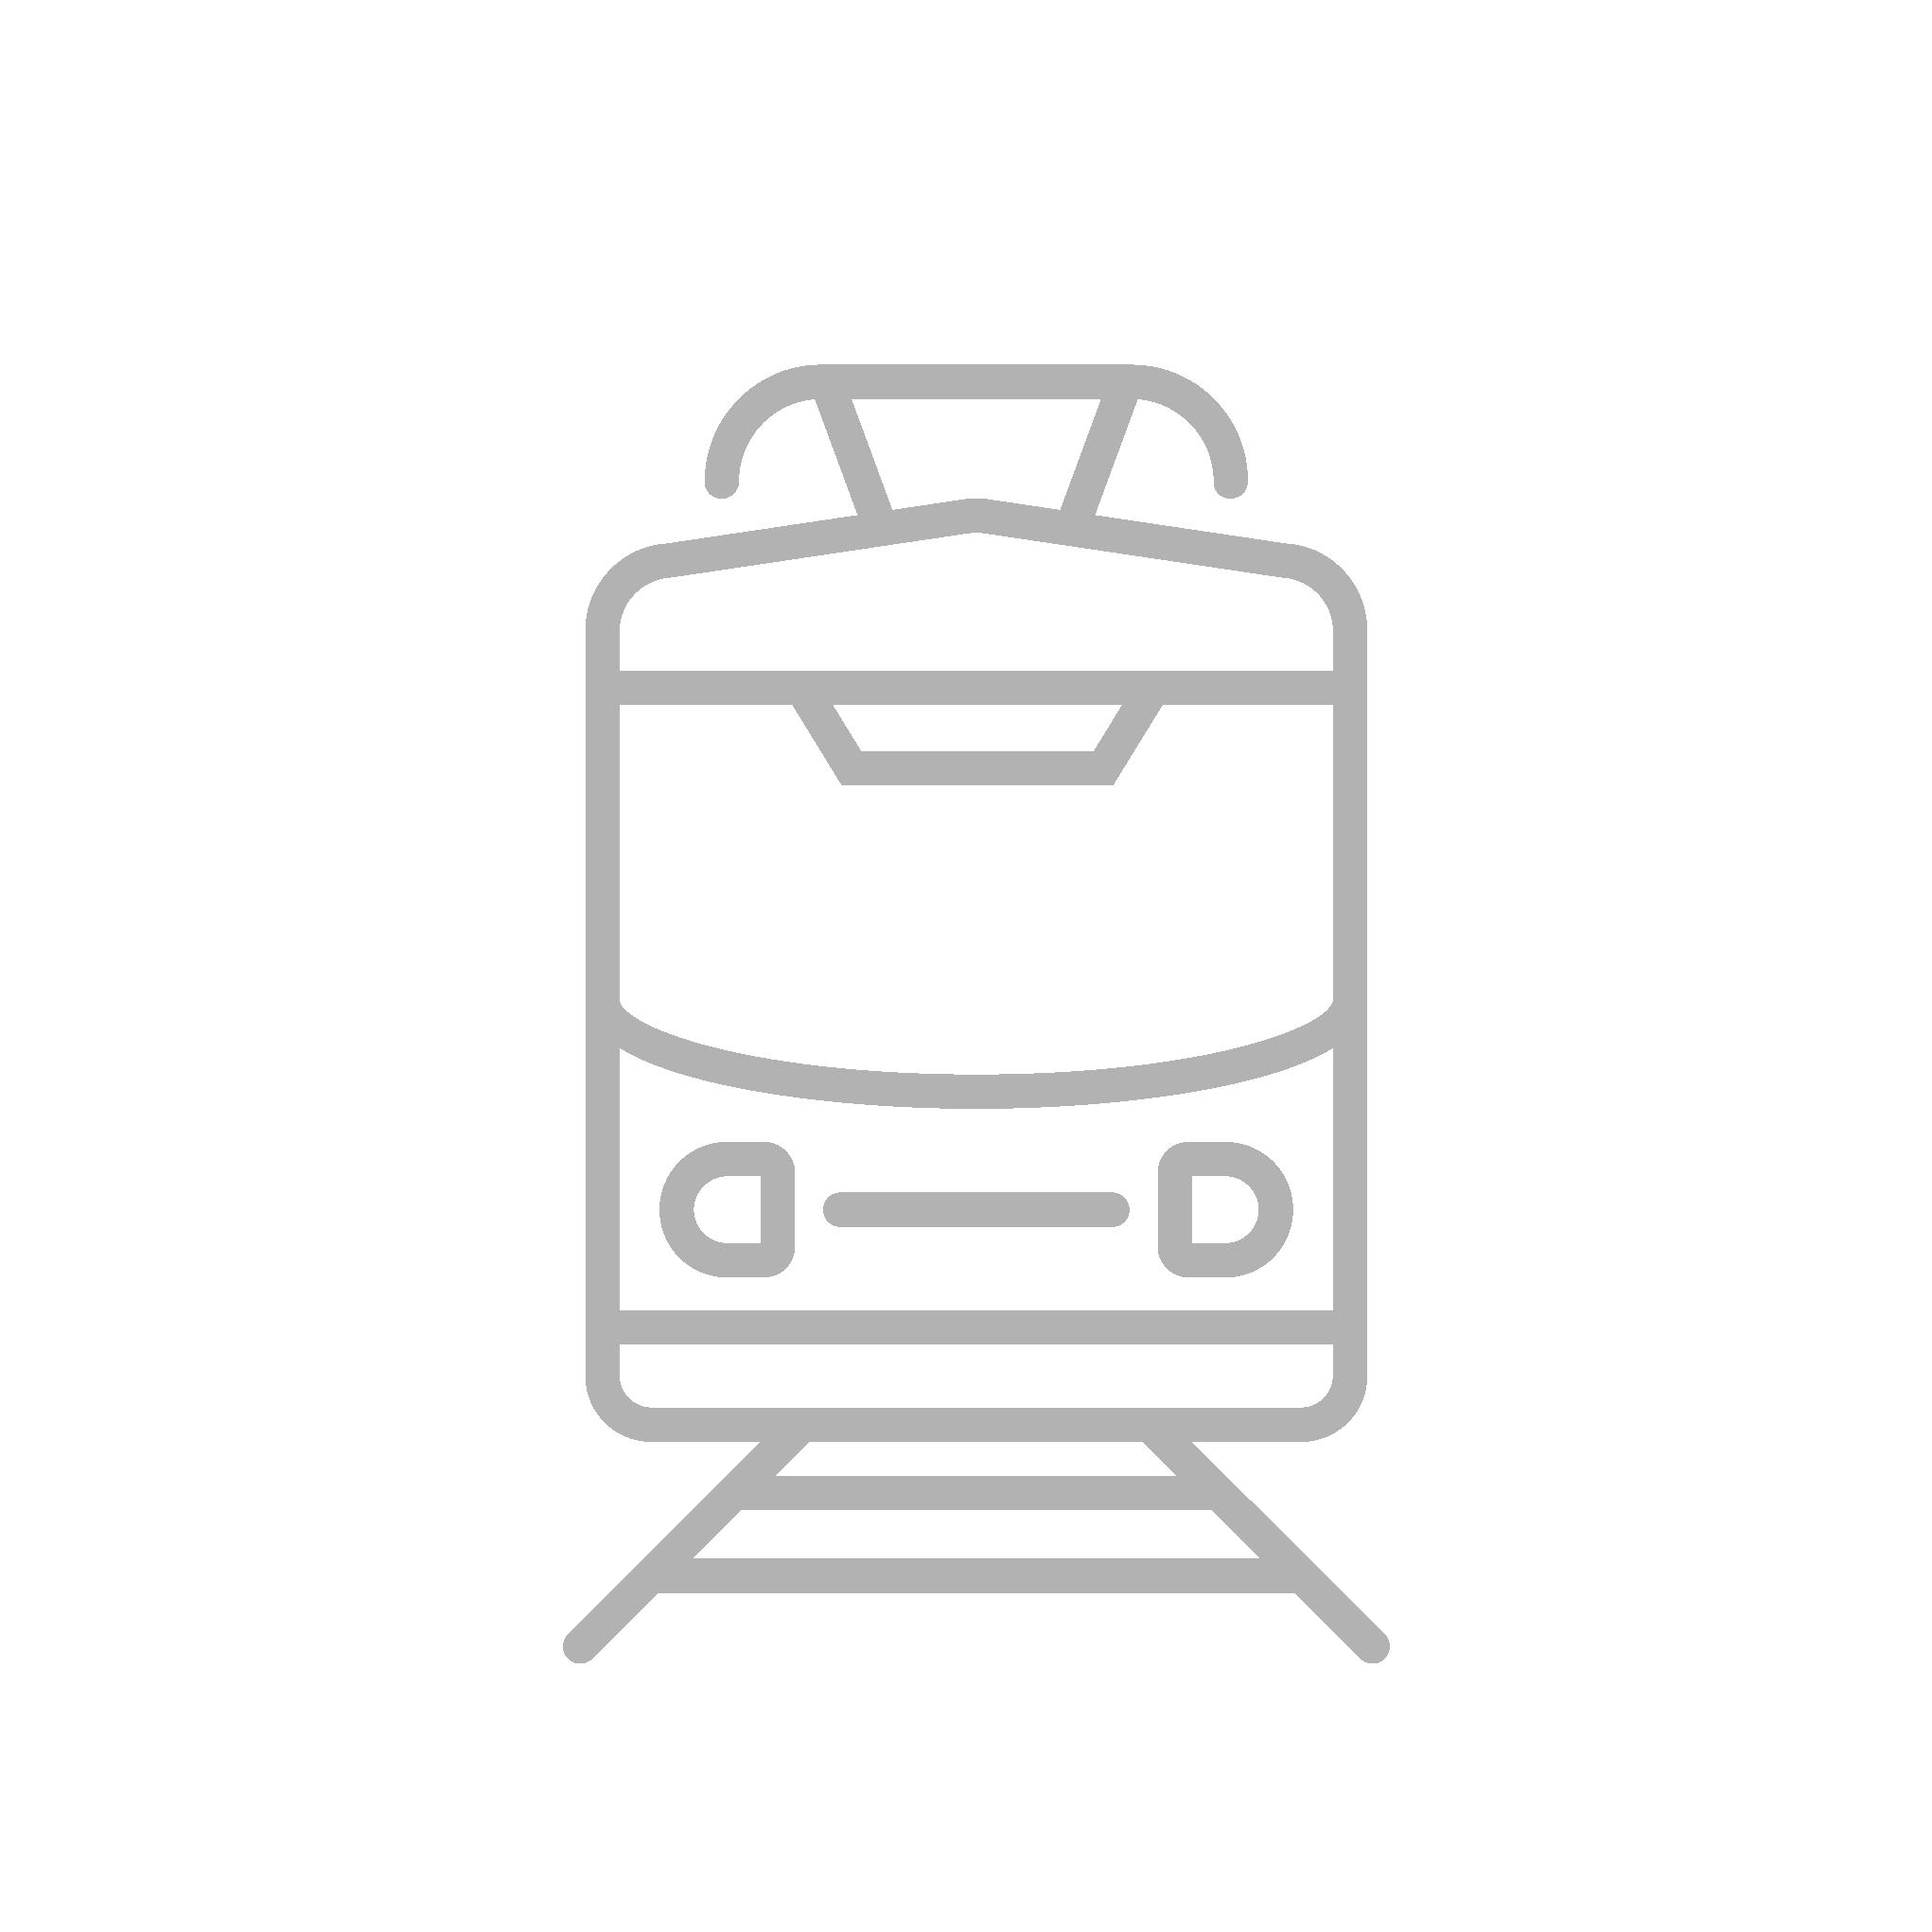 mobilite, transport, solutions public